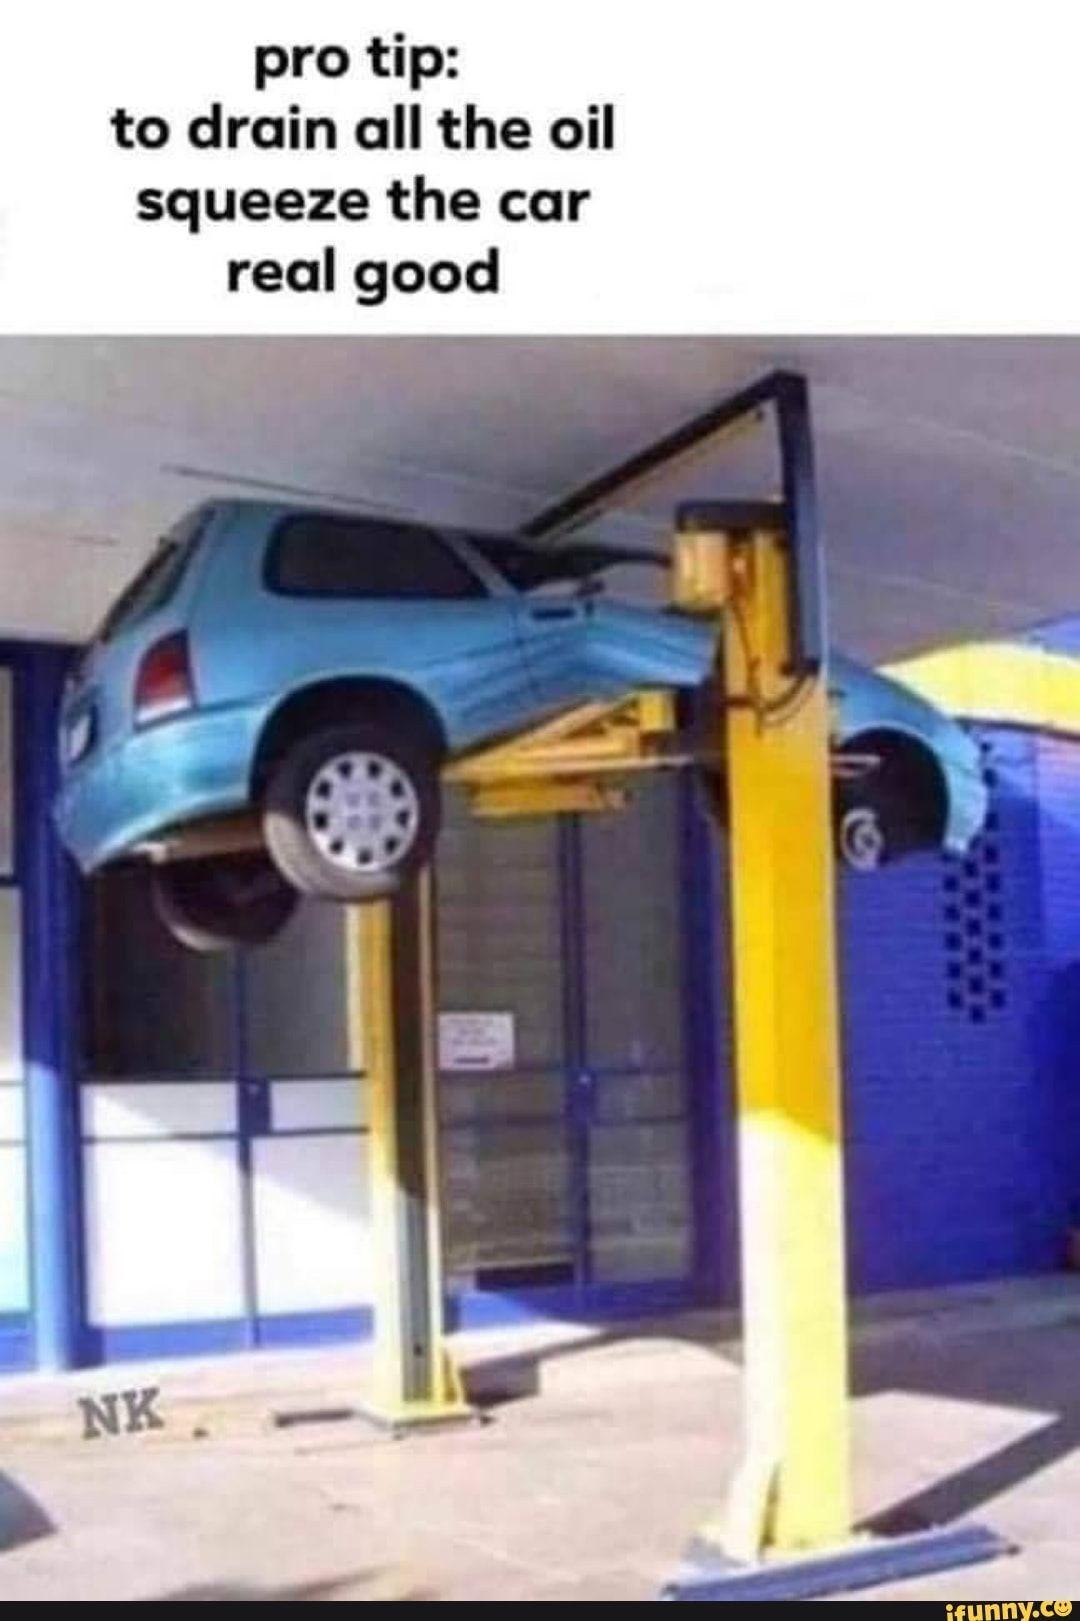 car memes funny hilariouscarmemes car_memes в 2020 г